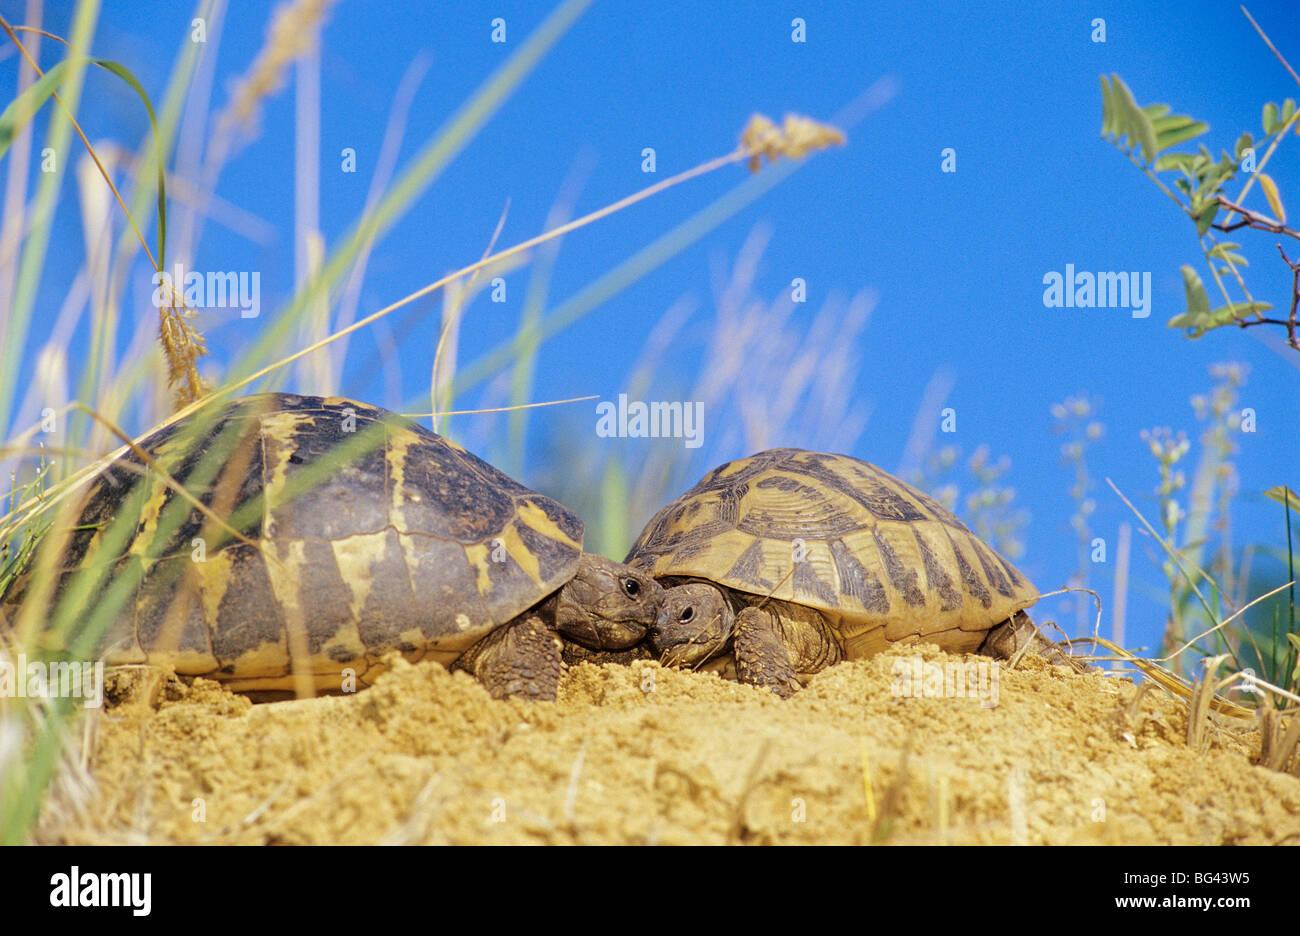 two turtles - fighting - Stock Image